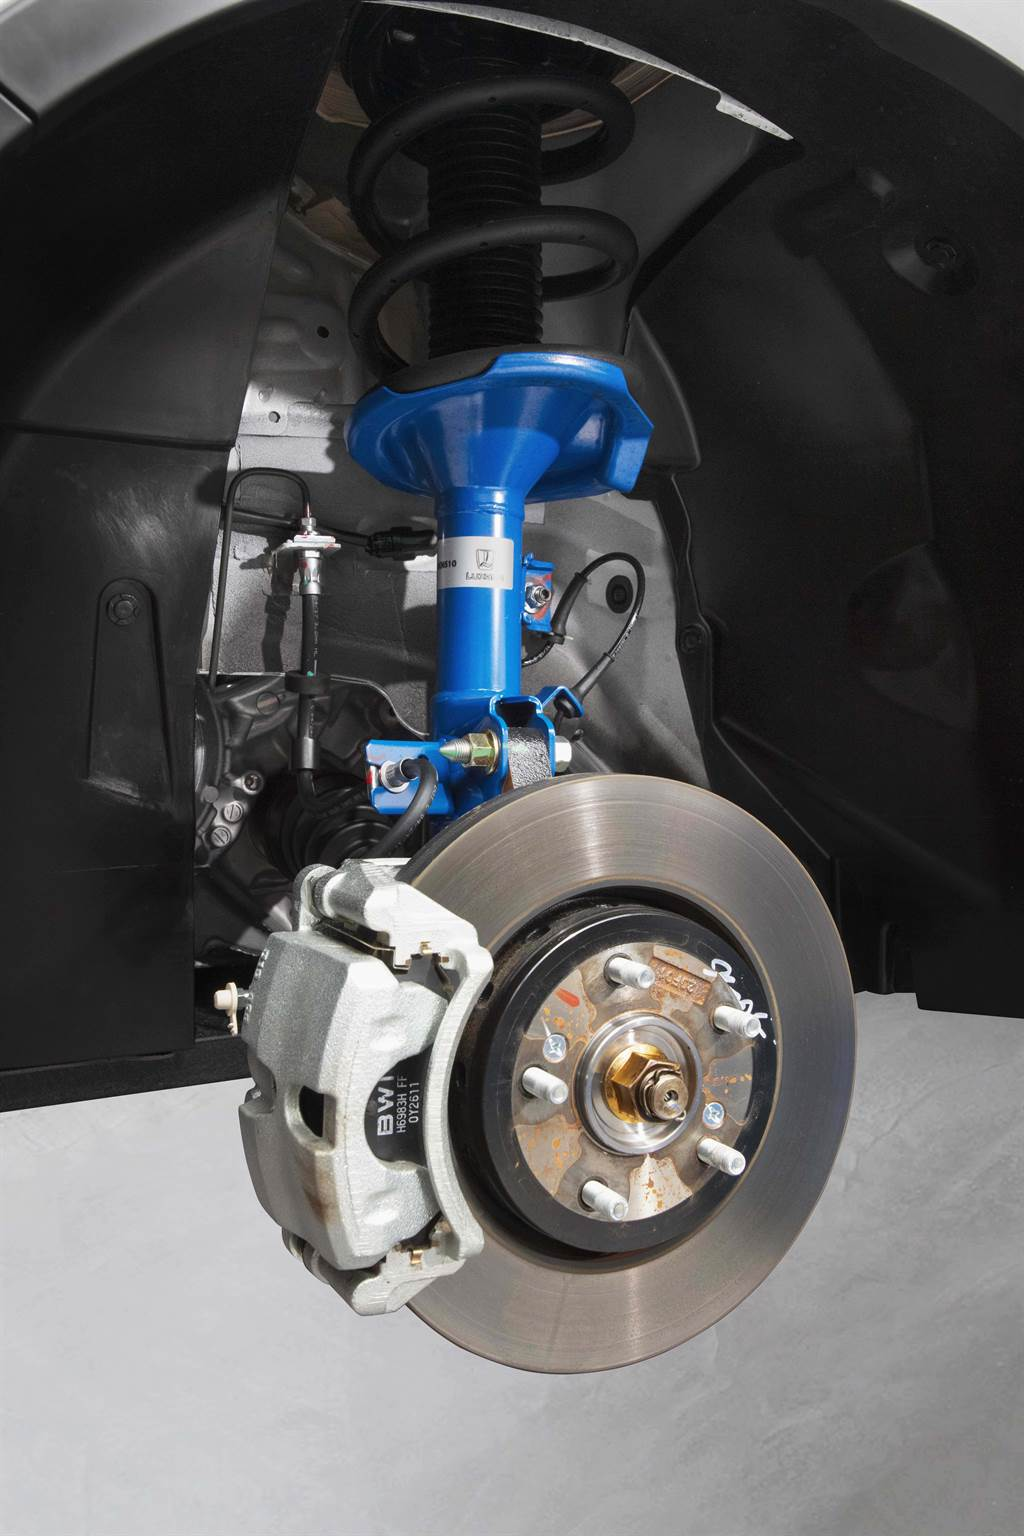 U6 藍調倍適版採用倍適登避震器,用性能給你安全,讓每次進出彎道都能四輪貼地、輕鬆寫意。